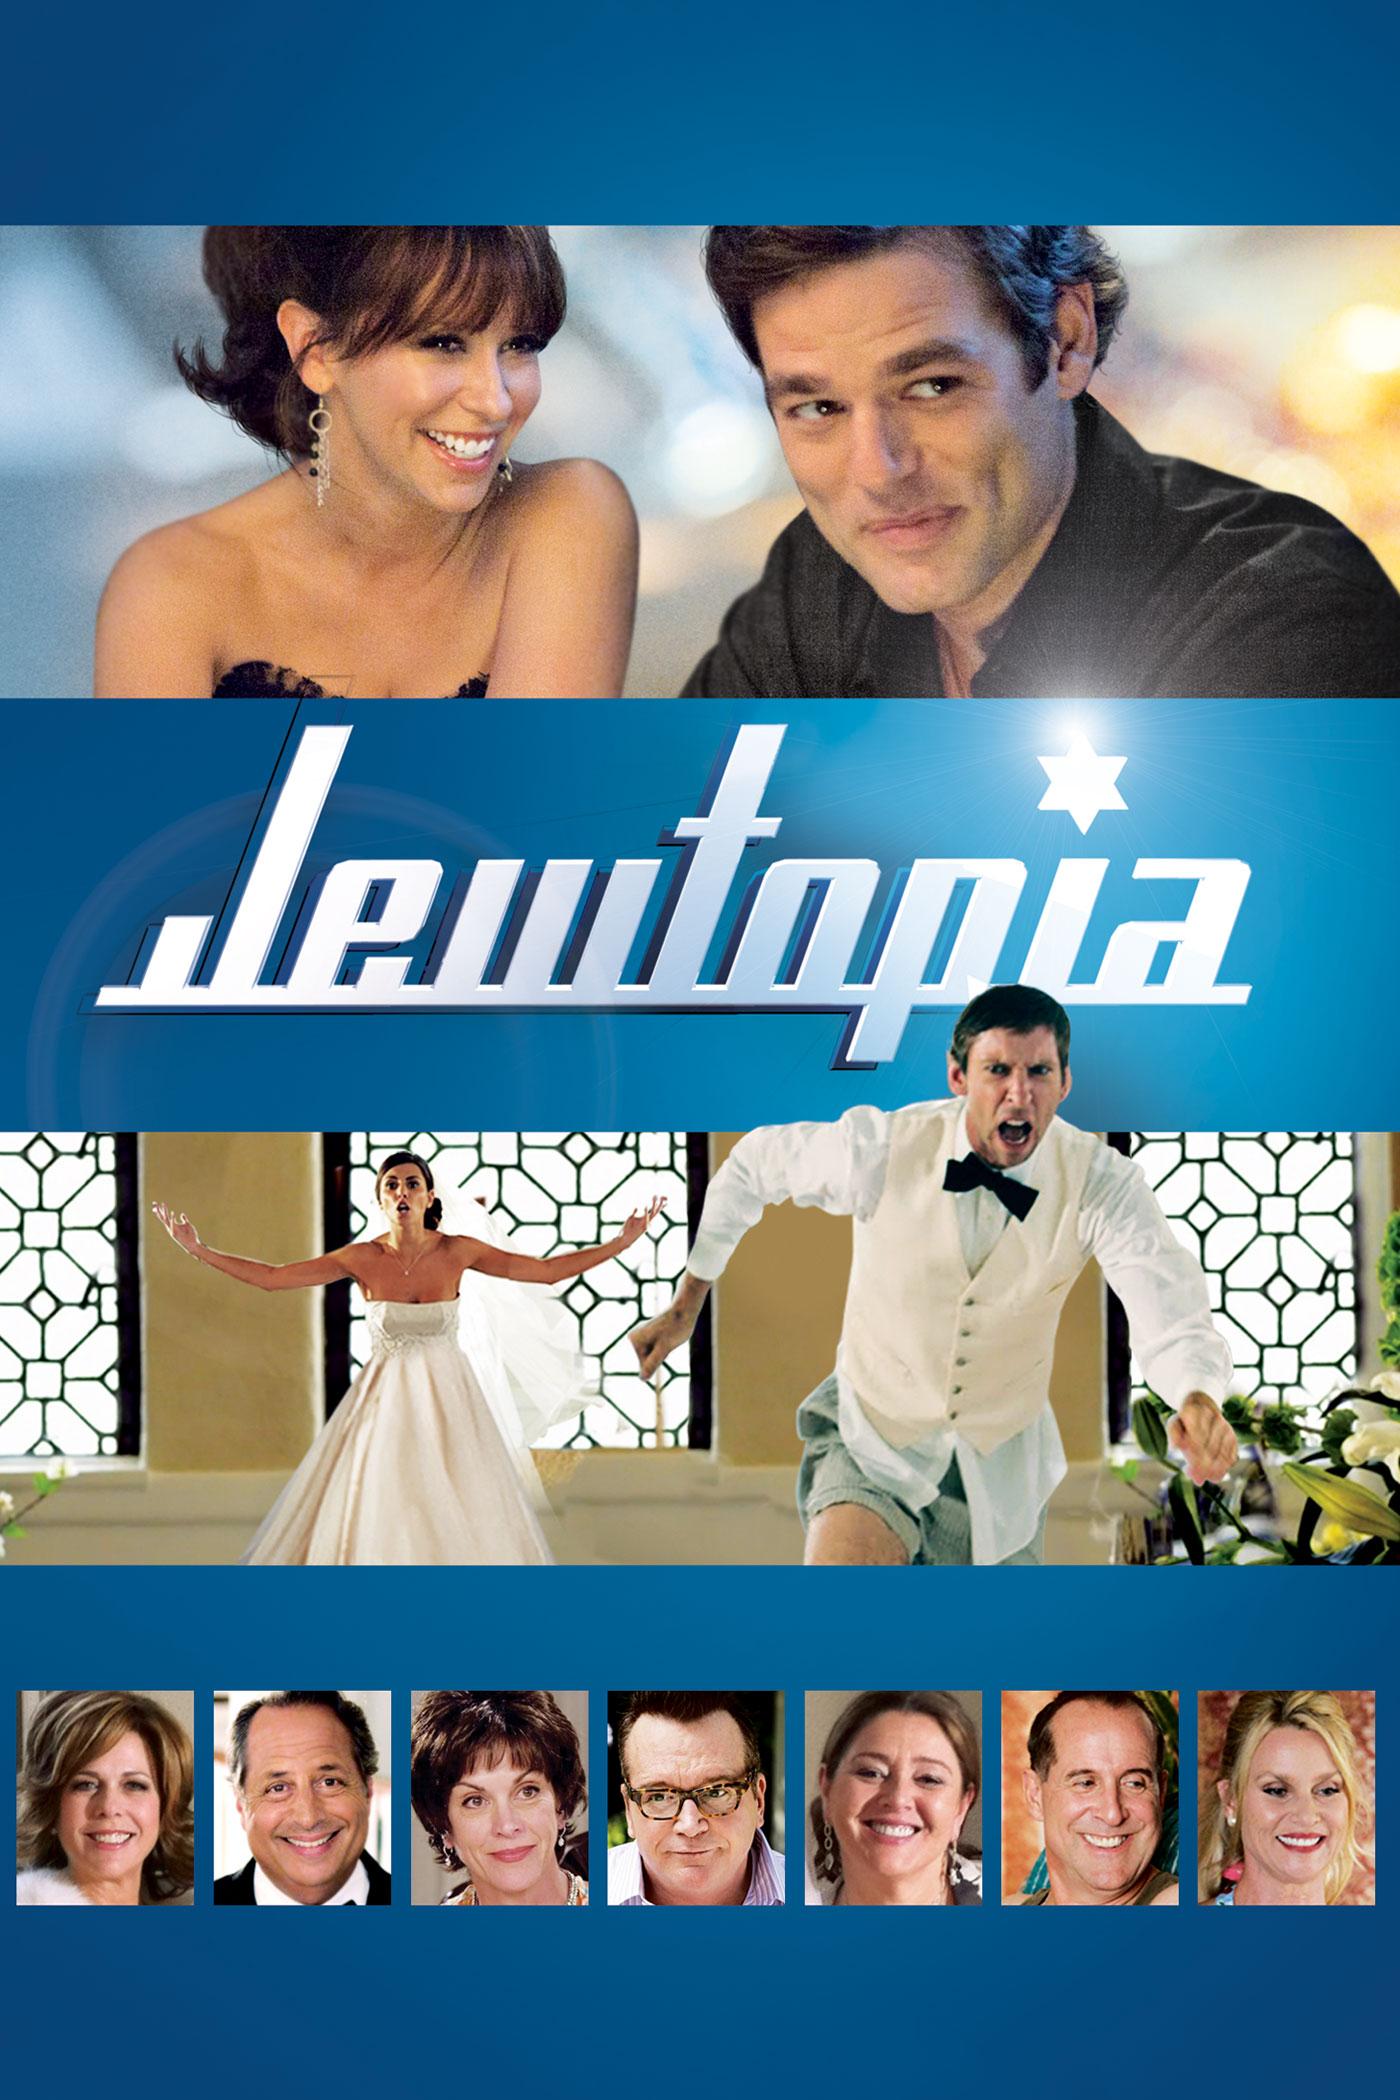 Jewtopia (2012)